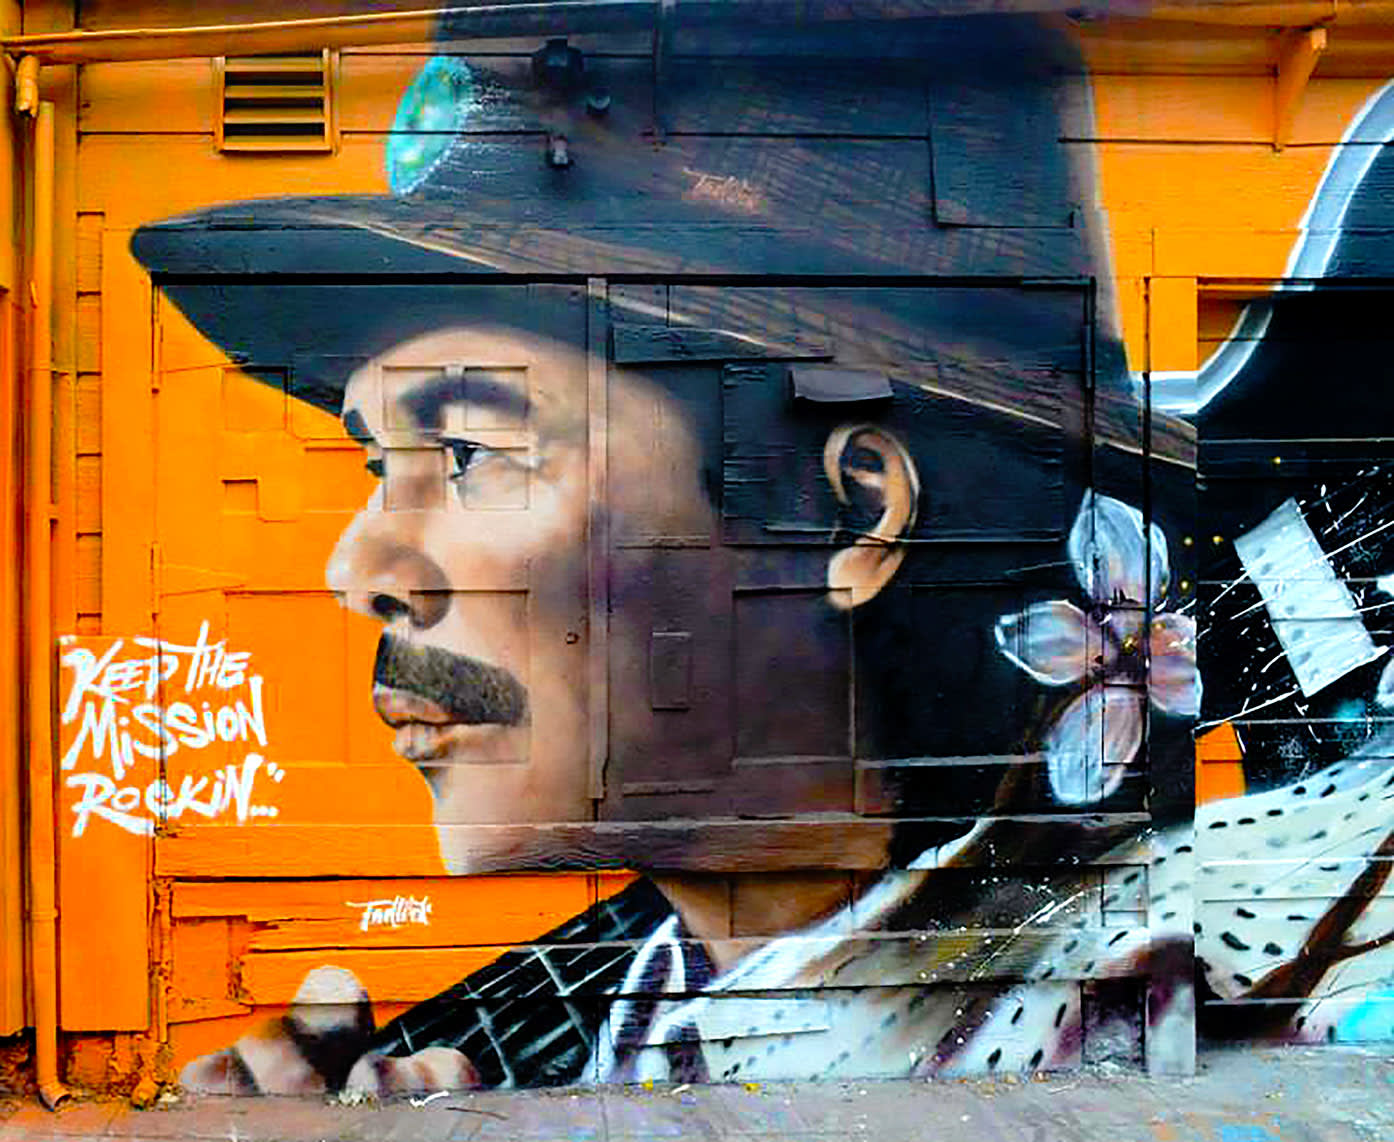 Murals by Alexander Tadlock seen at San Francisco, CA, San Francisco - Keep The Mission Rockin